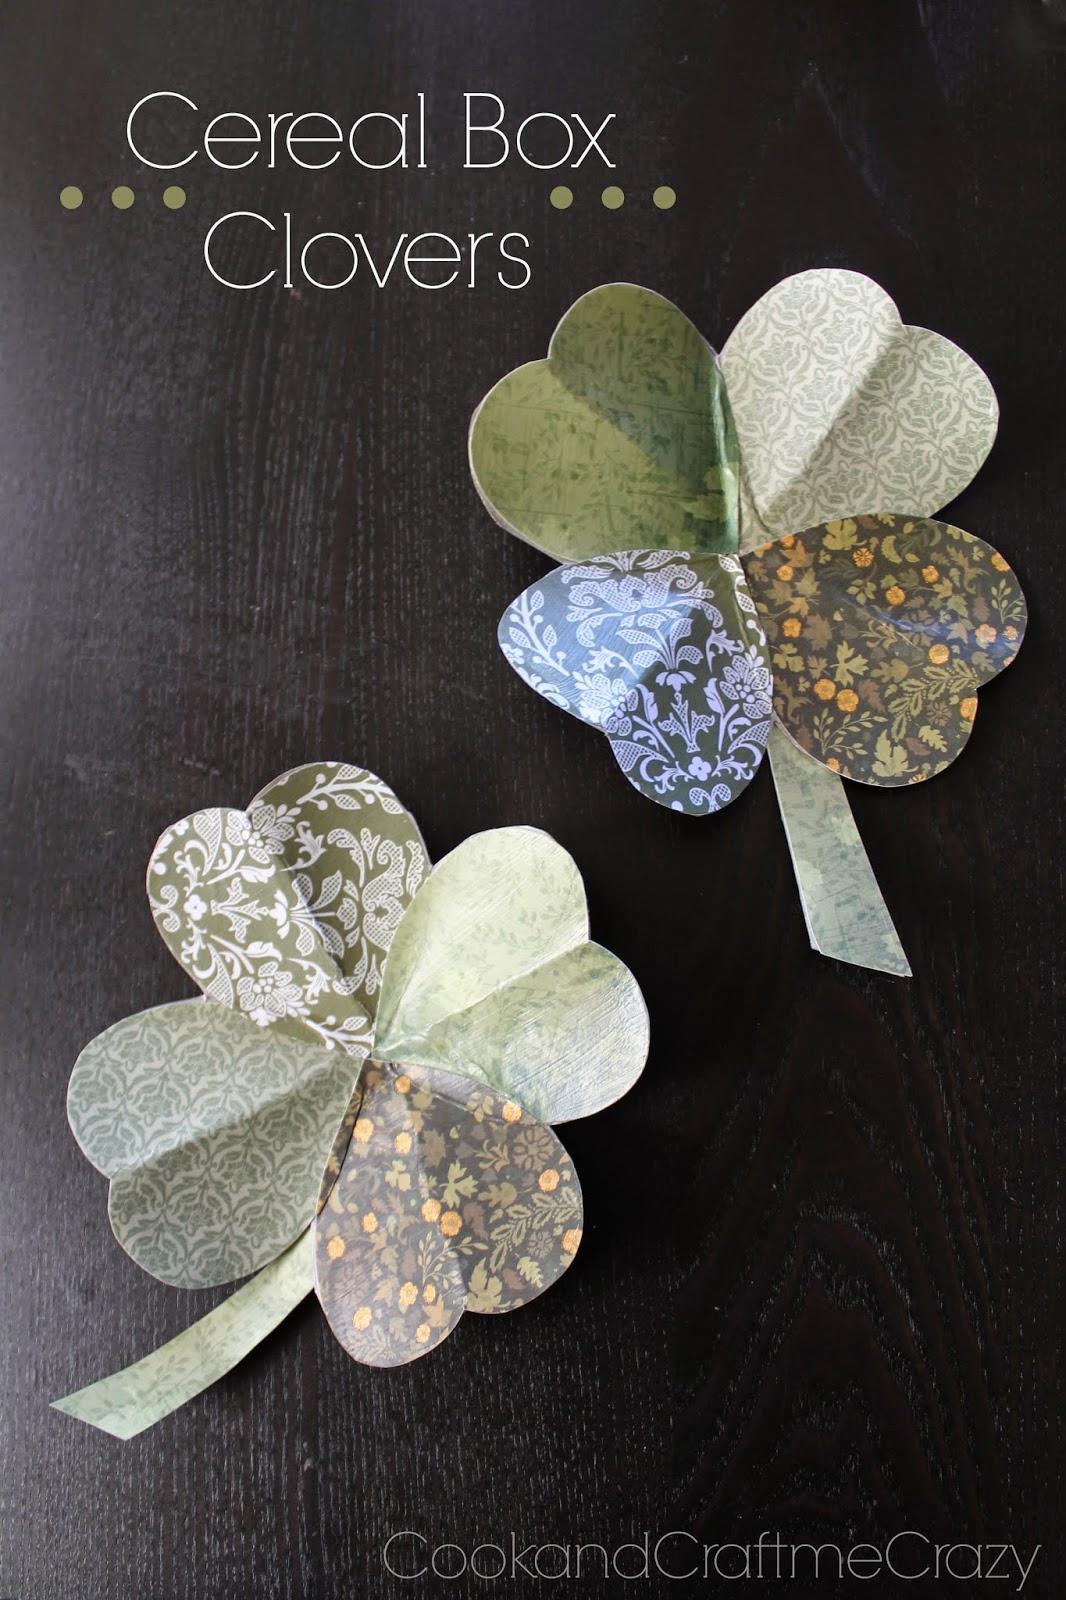 http://cookandcraftmecrazy.blogspot.com/2014/02/cereal-box-clovers.html